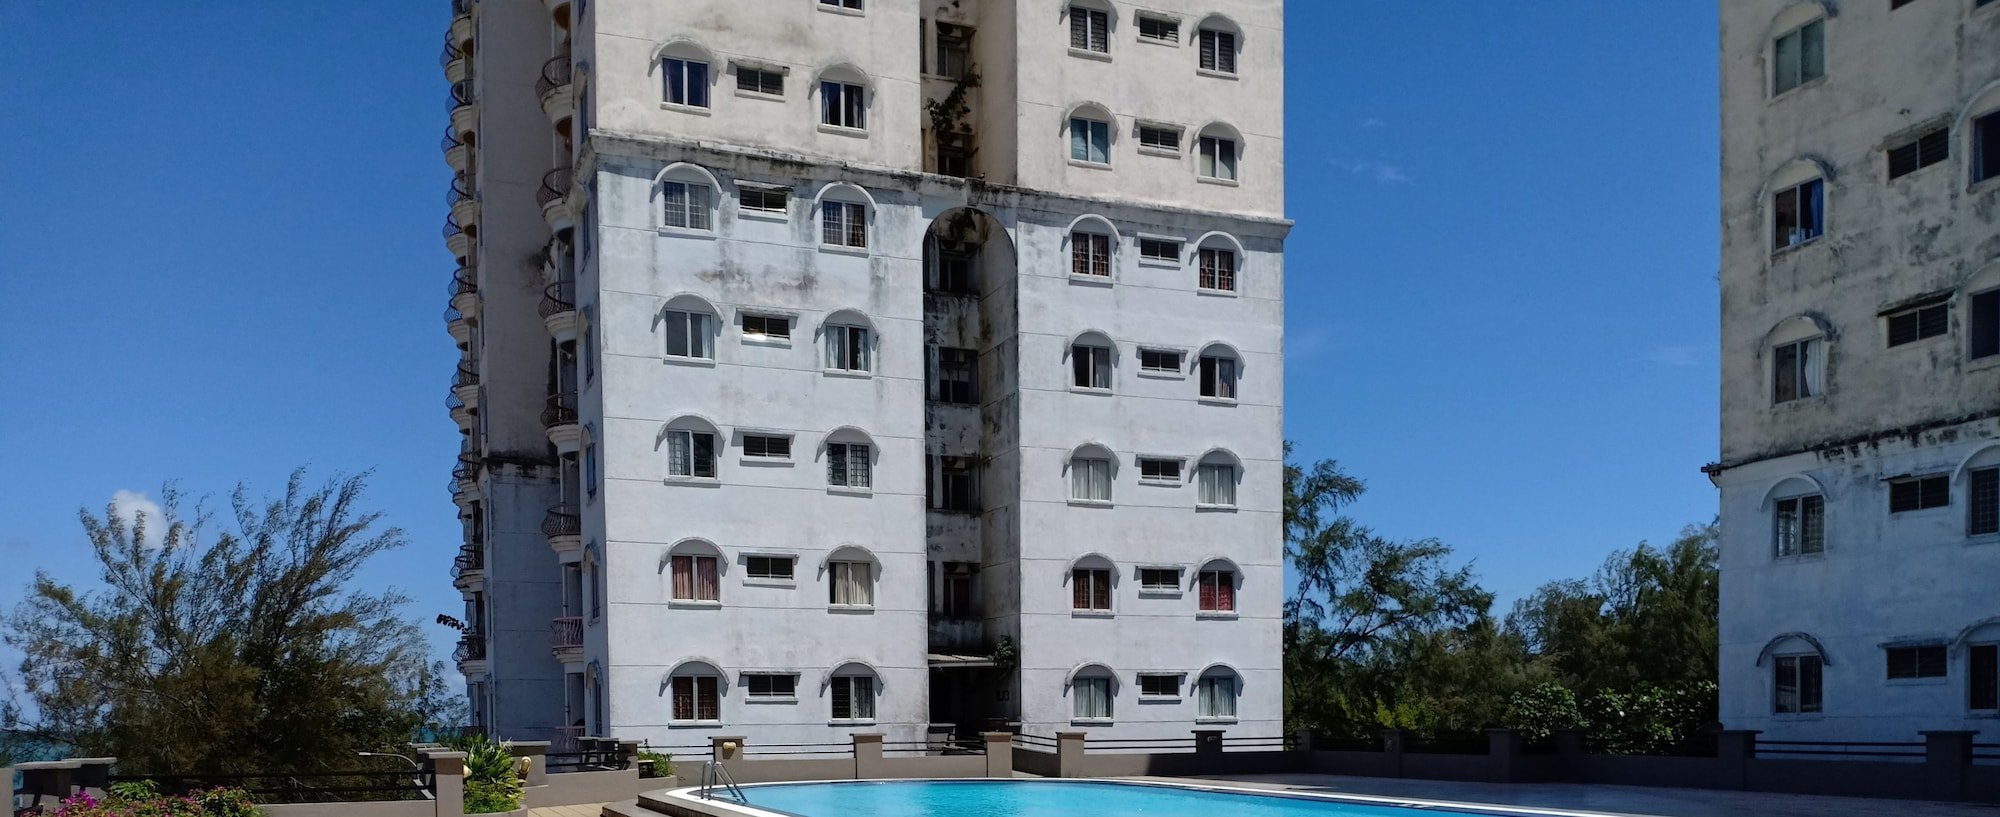 JC Apartment Sunshine Bay Resort, Port Dickson